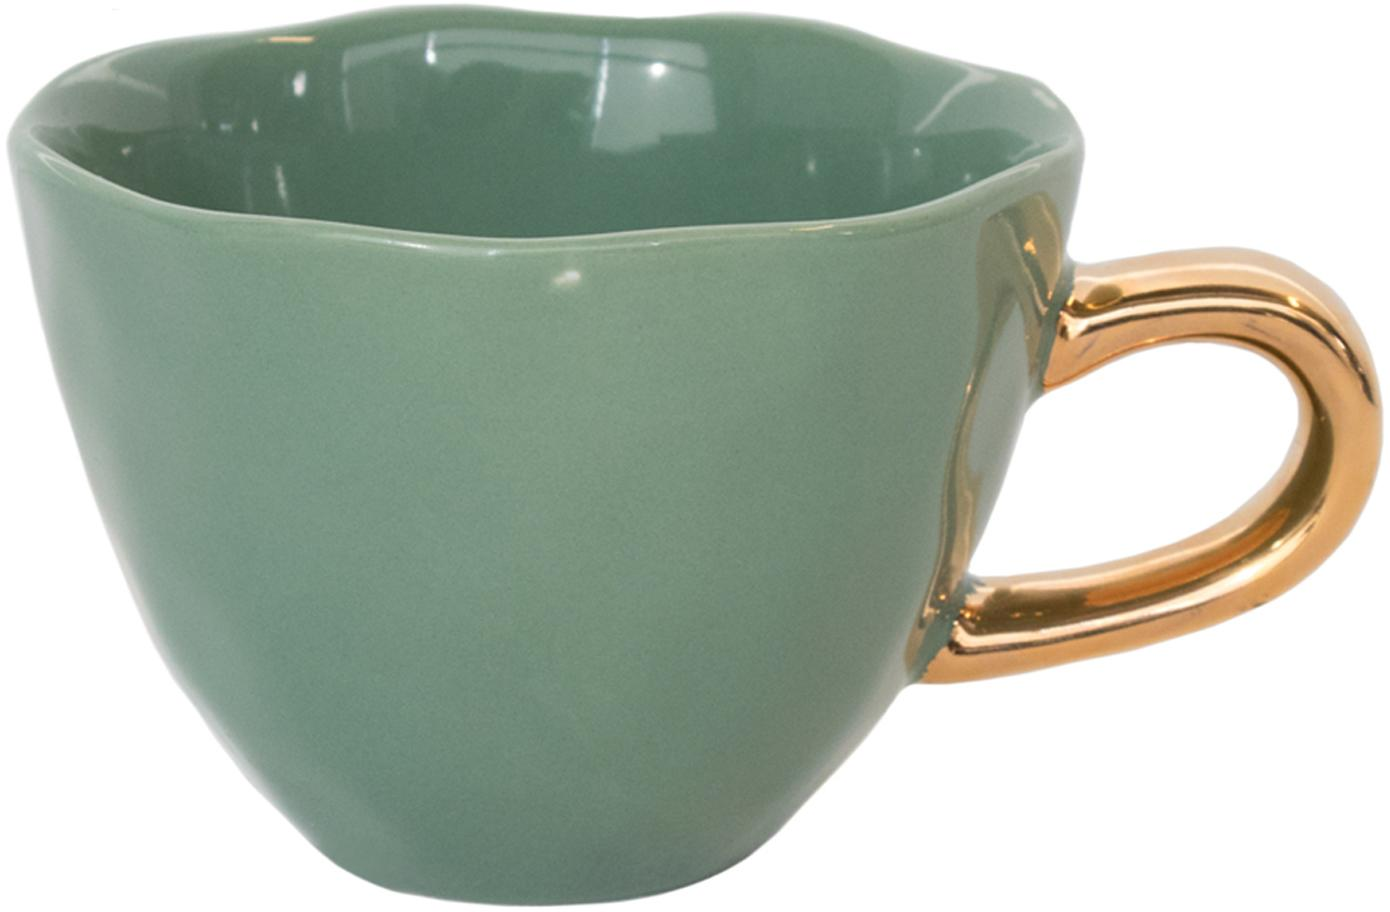 Koffiekopje Good Morning, New Bone China, Donkergroen, goudkleurig, Ø 11 x H 8 cm